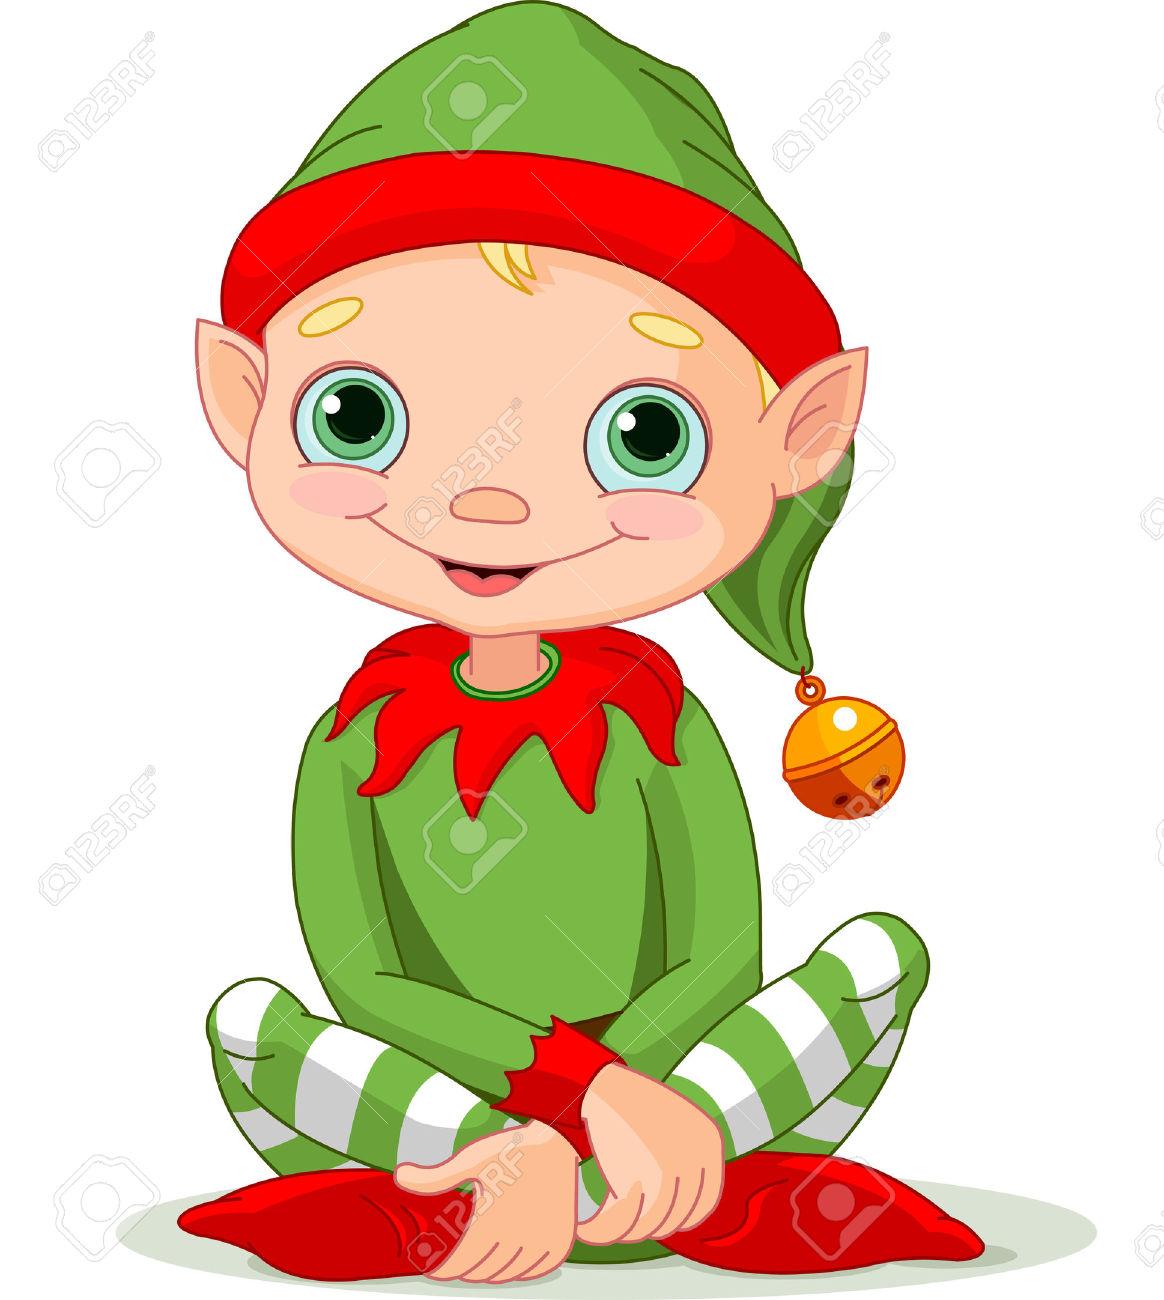 Christmas Elf Free Clipart-Christmas Elf Free Clipart-4